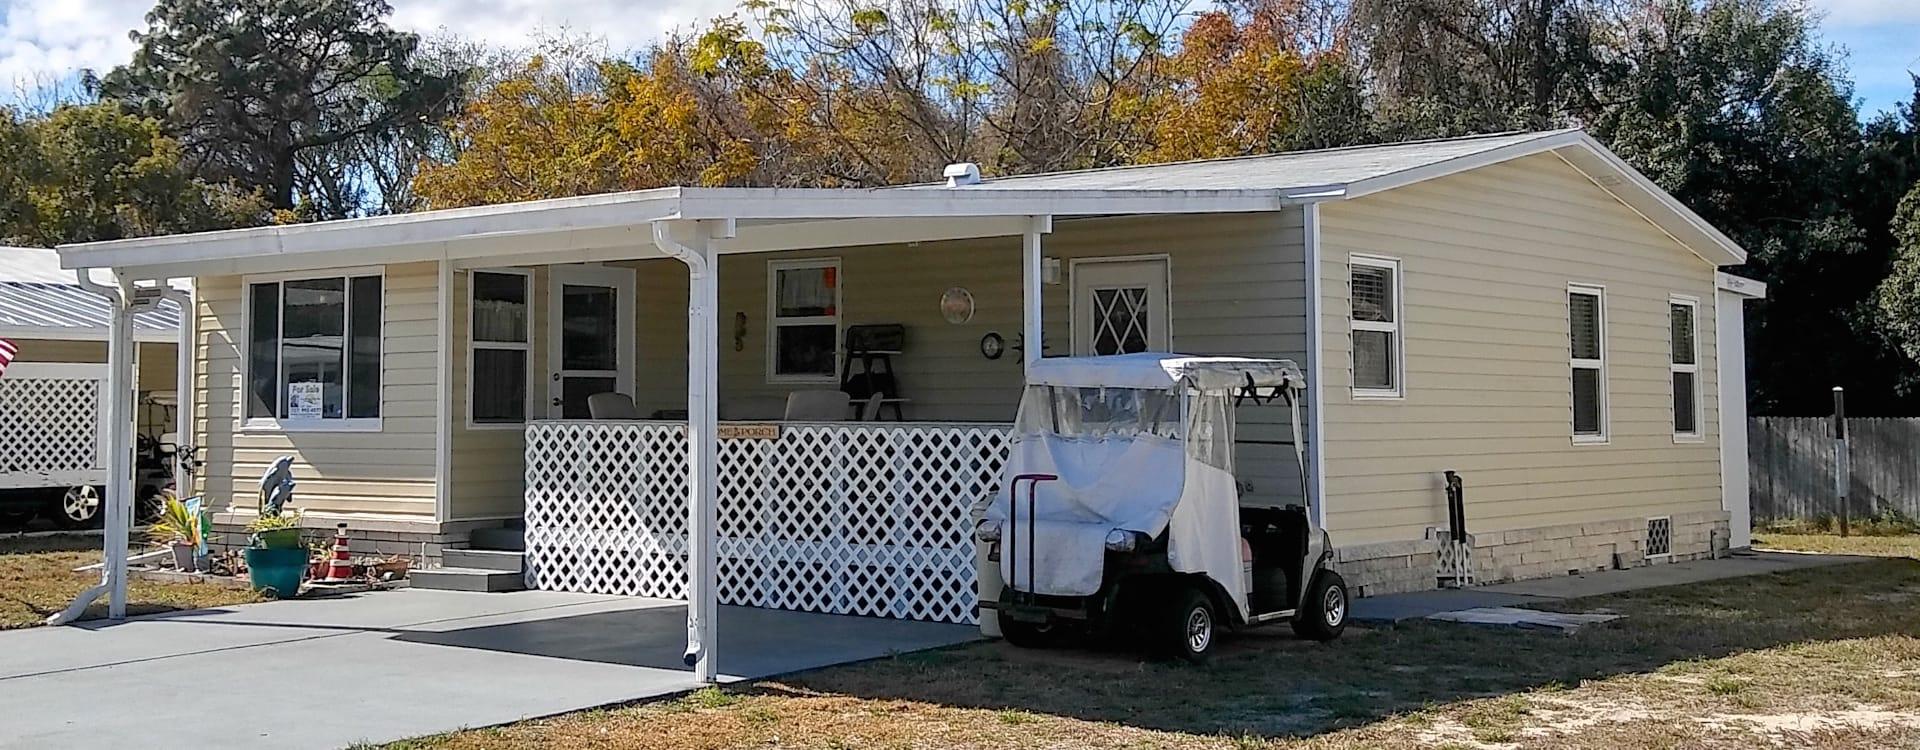 Palm Harbor Homes For Sale >> Mobile Home For Sale - Hudson, FL Shadow Wood Village #4